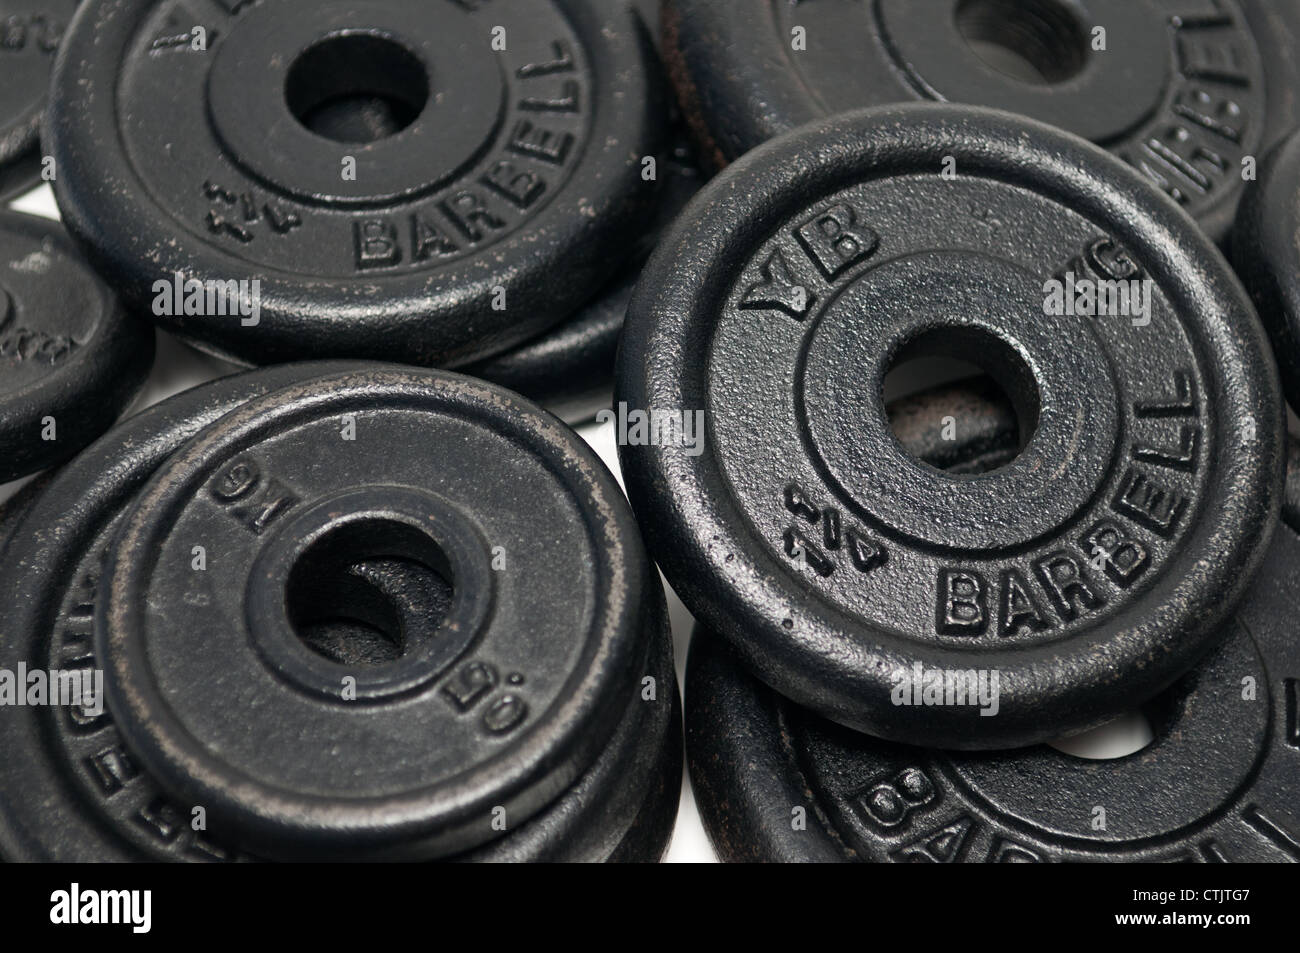 Pila di pesi dischi di peso Immagini Stock